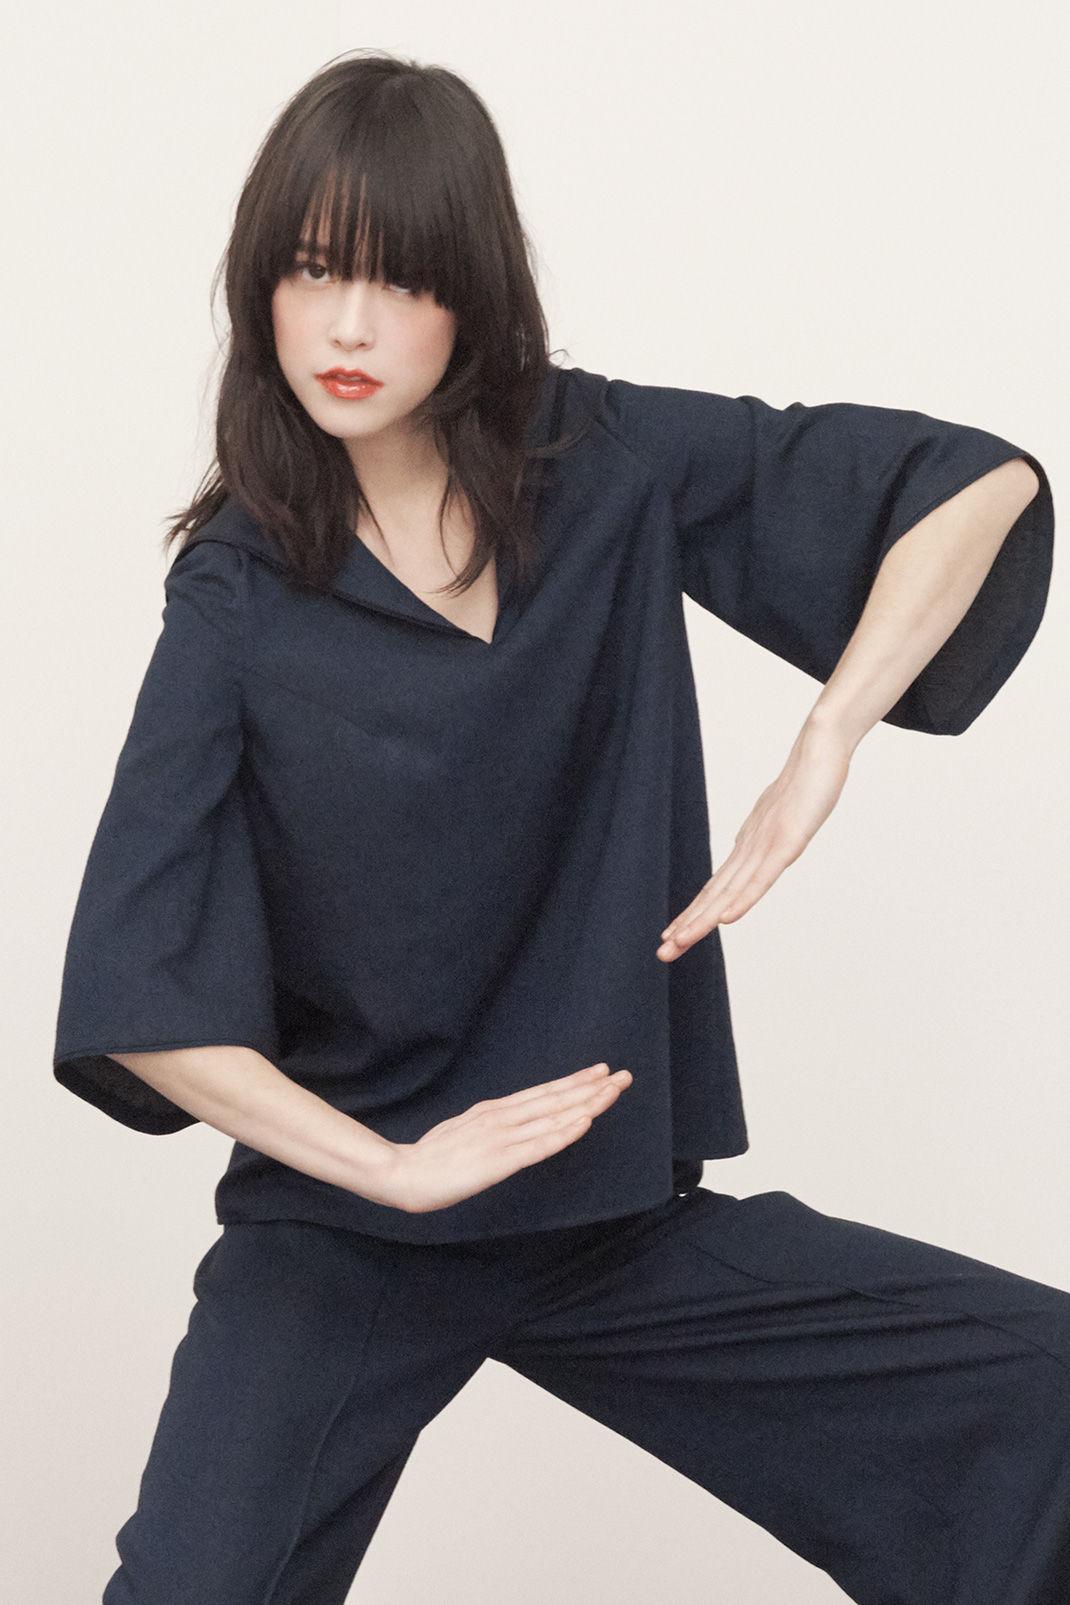 Kenzo-fashion-show-pre-fall-2016-ready-to-wear-the-impression-02